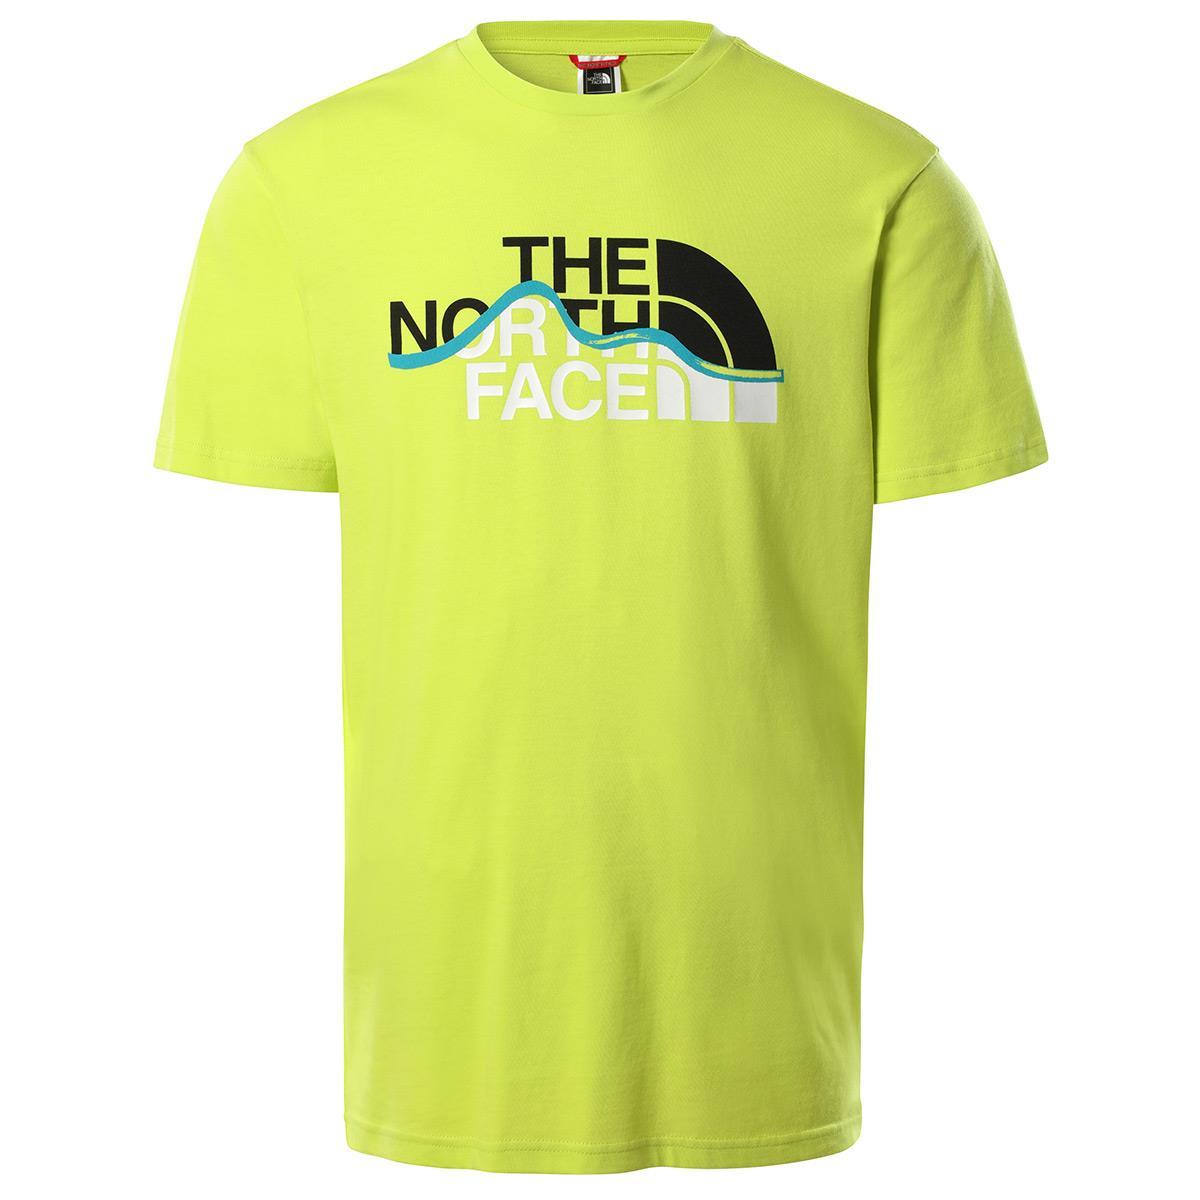 The North Face  Erkek S/S MOUNTAIN LINE Tişört